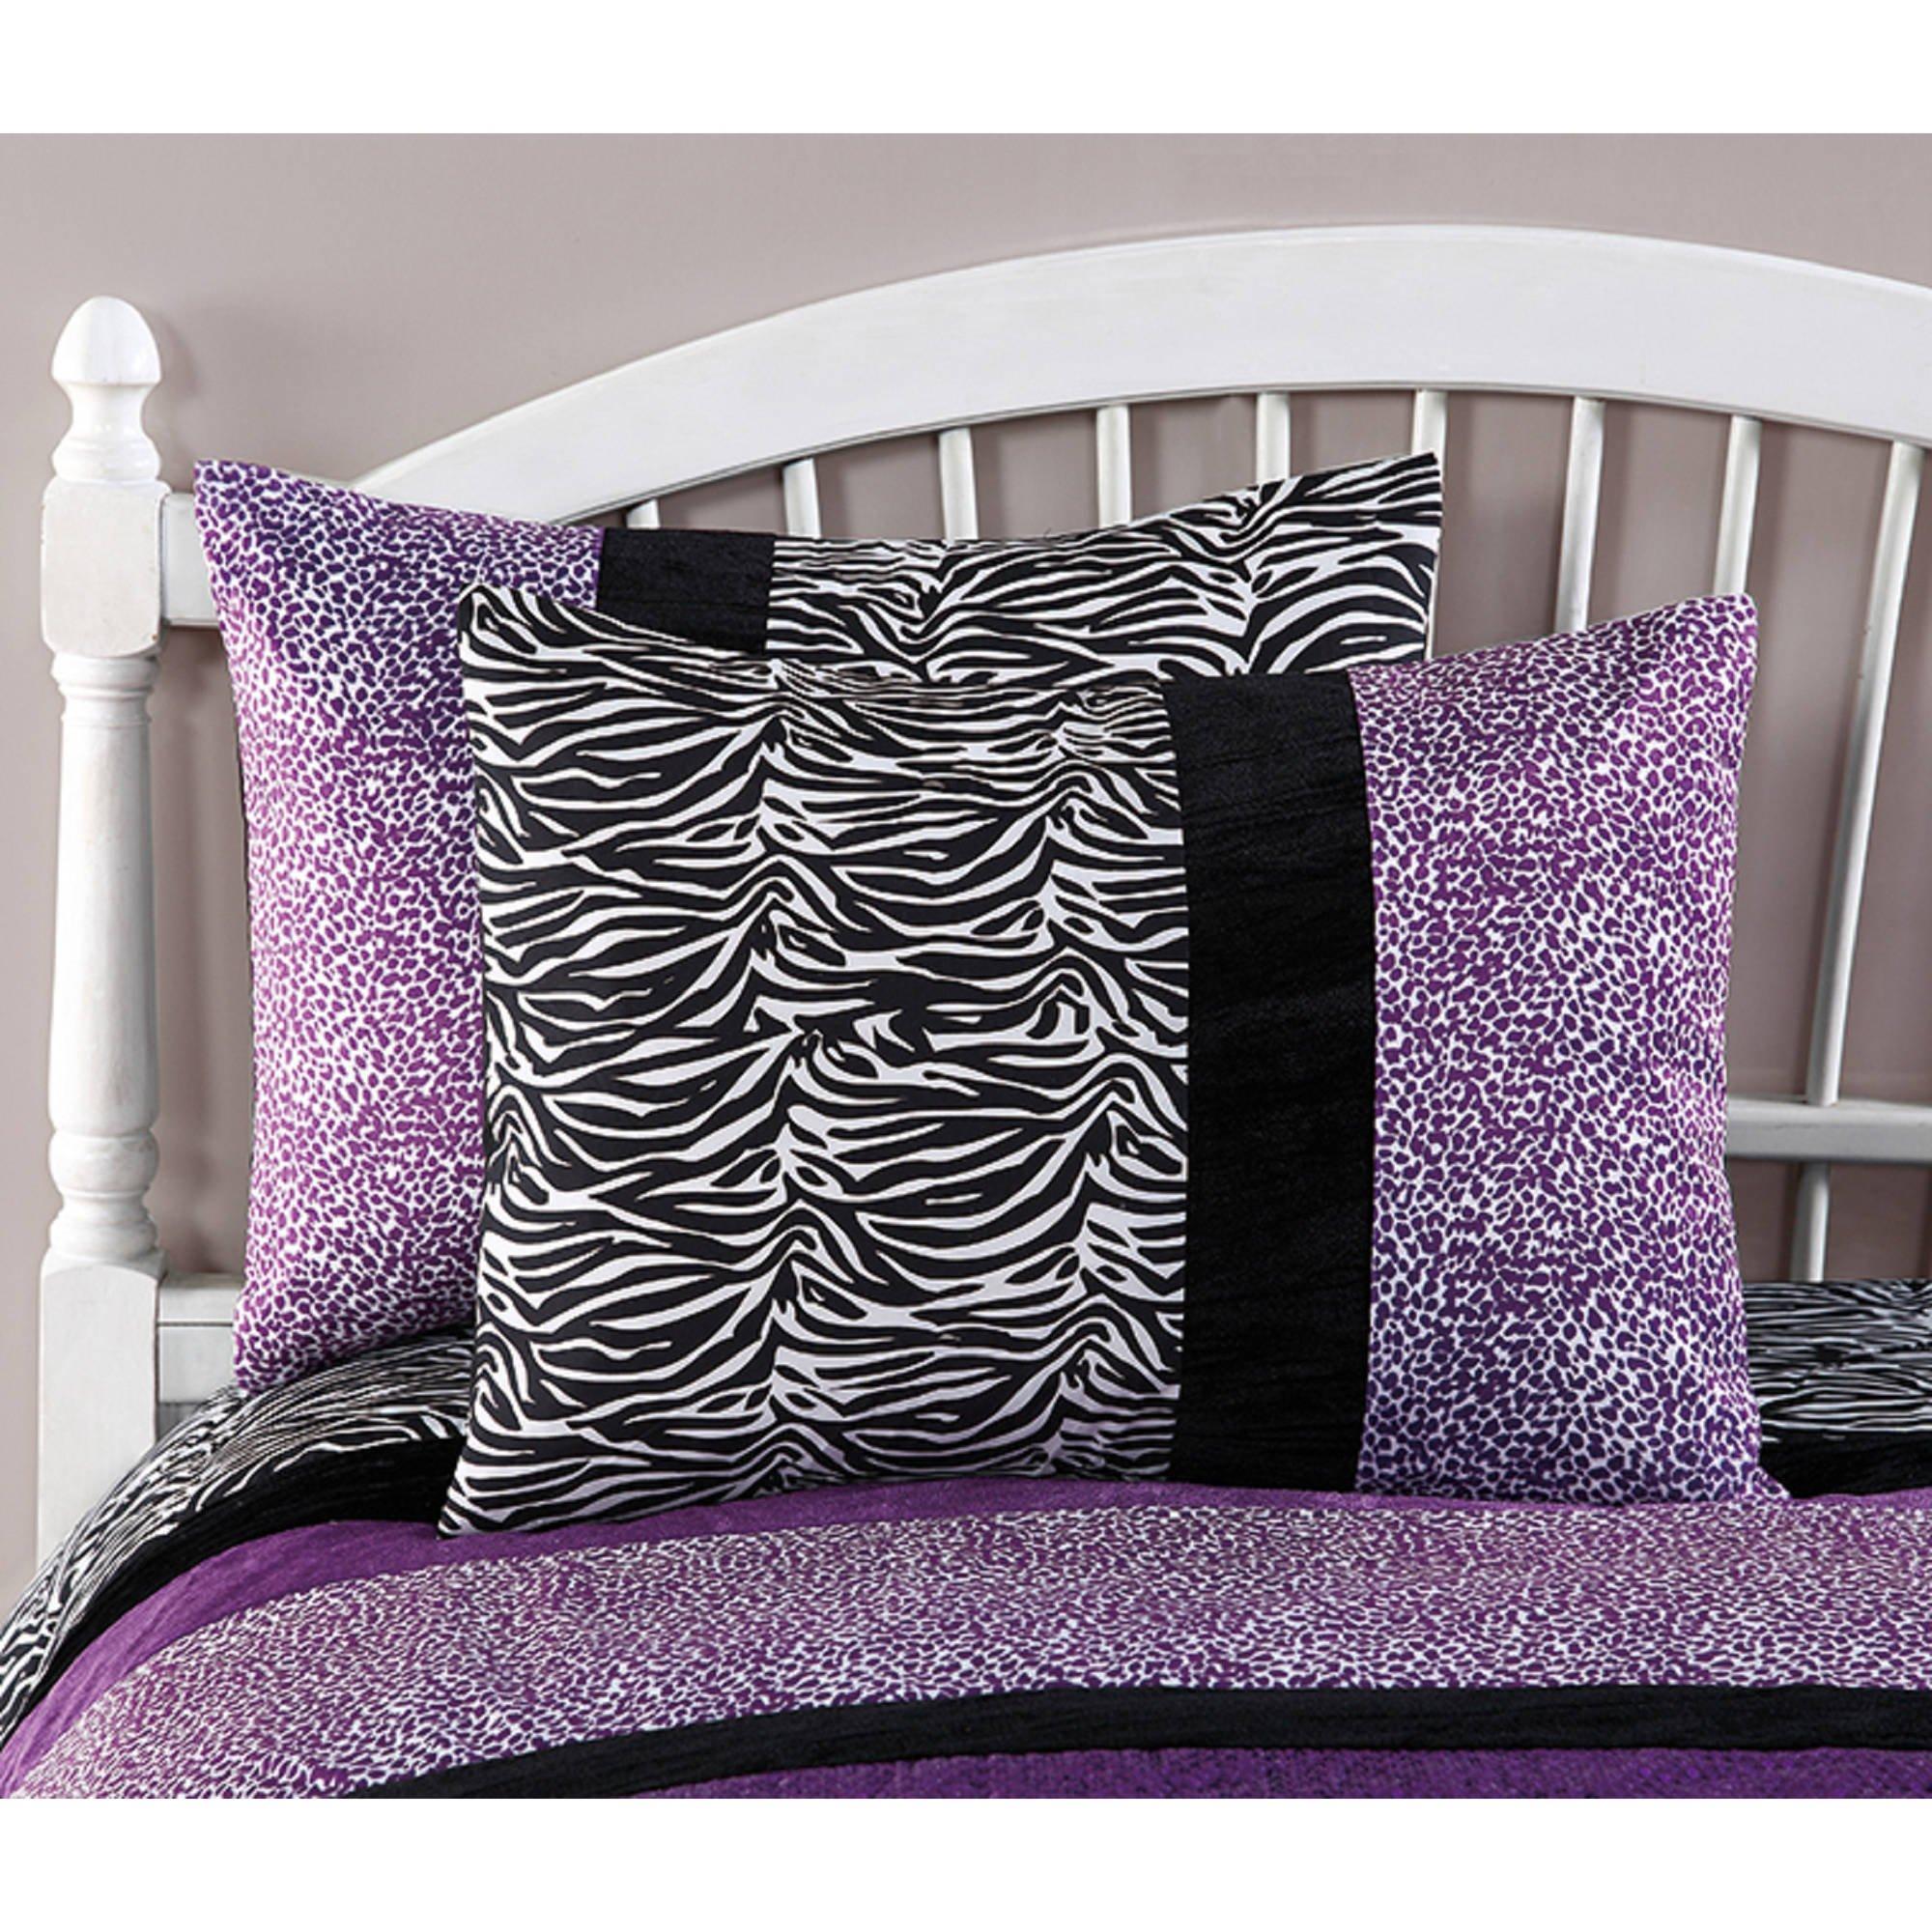 CA 3 Piece Girls Violet Purple Glitter Cheetah Print Comforter Full Queen Set, Black White Zebra Stripes Bedding Plum Spotted Animal Print Safari Jungle Zoo Wild Exotic, Reversible Solid Polyester by CA (Image #1)